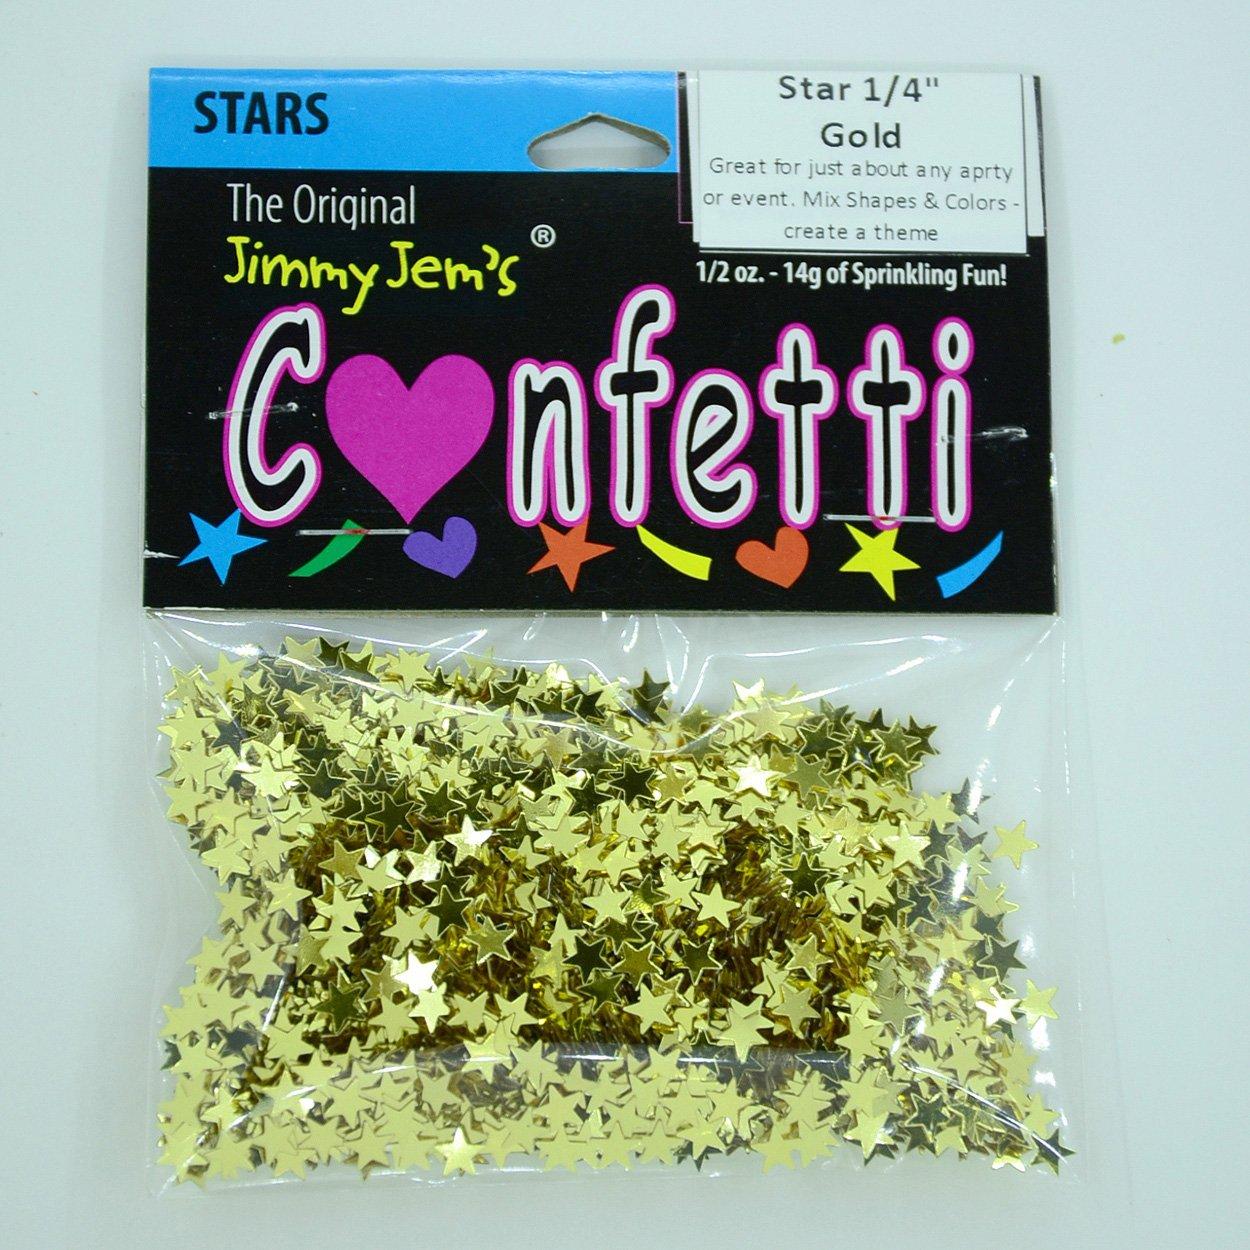 2 Half Oz Bags 8522 Confetti Star 1//4 Gold 1 oz